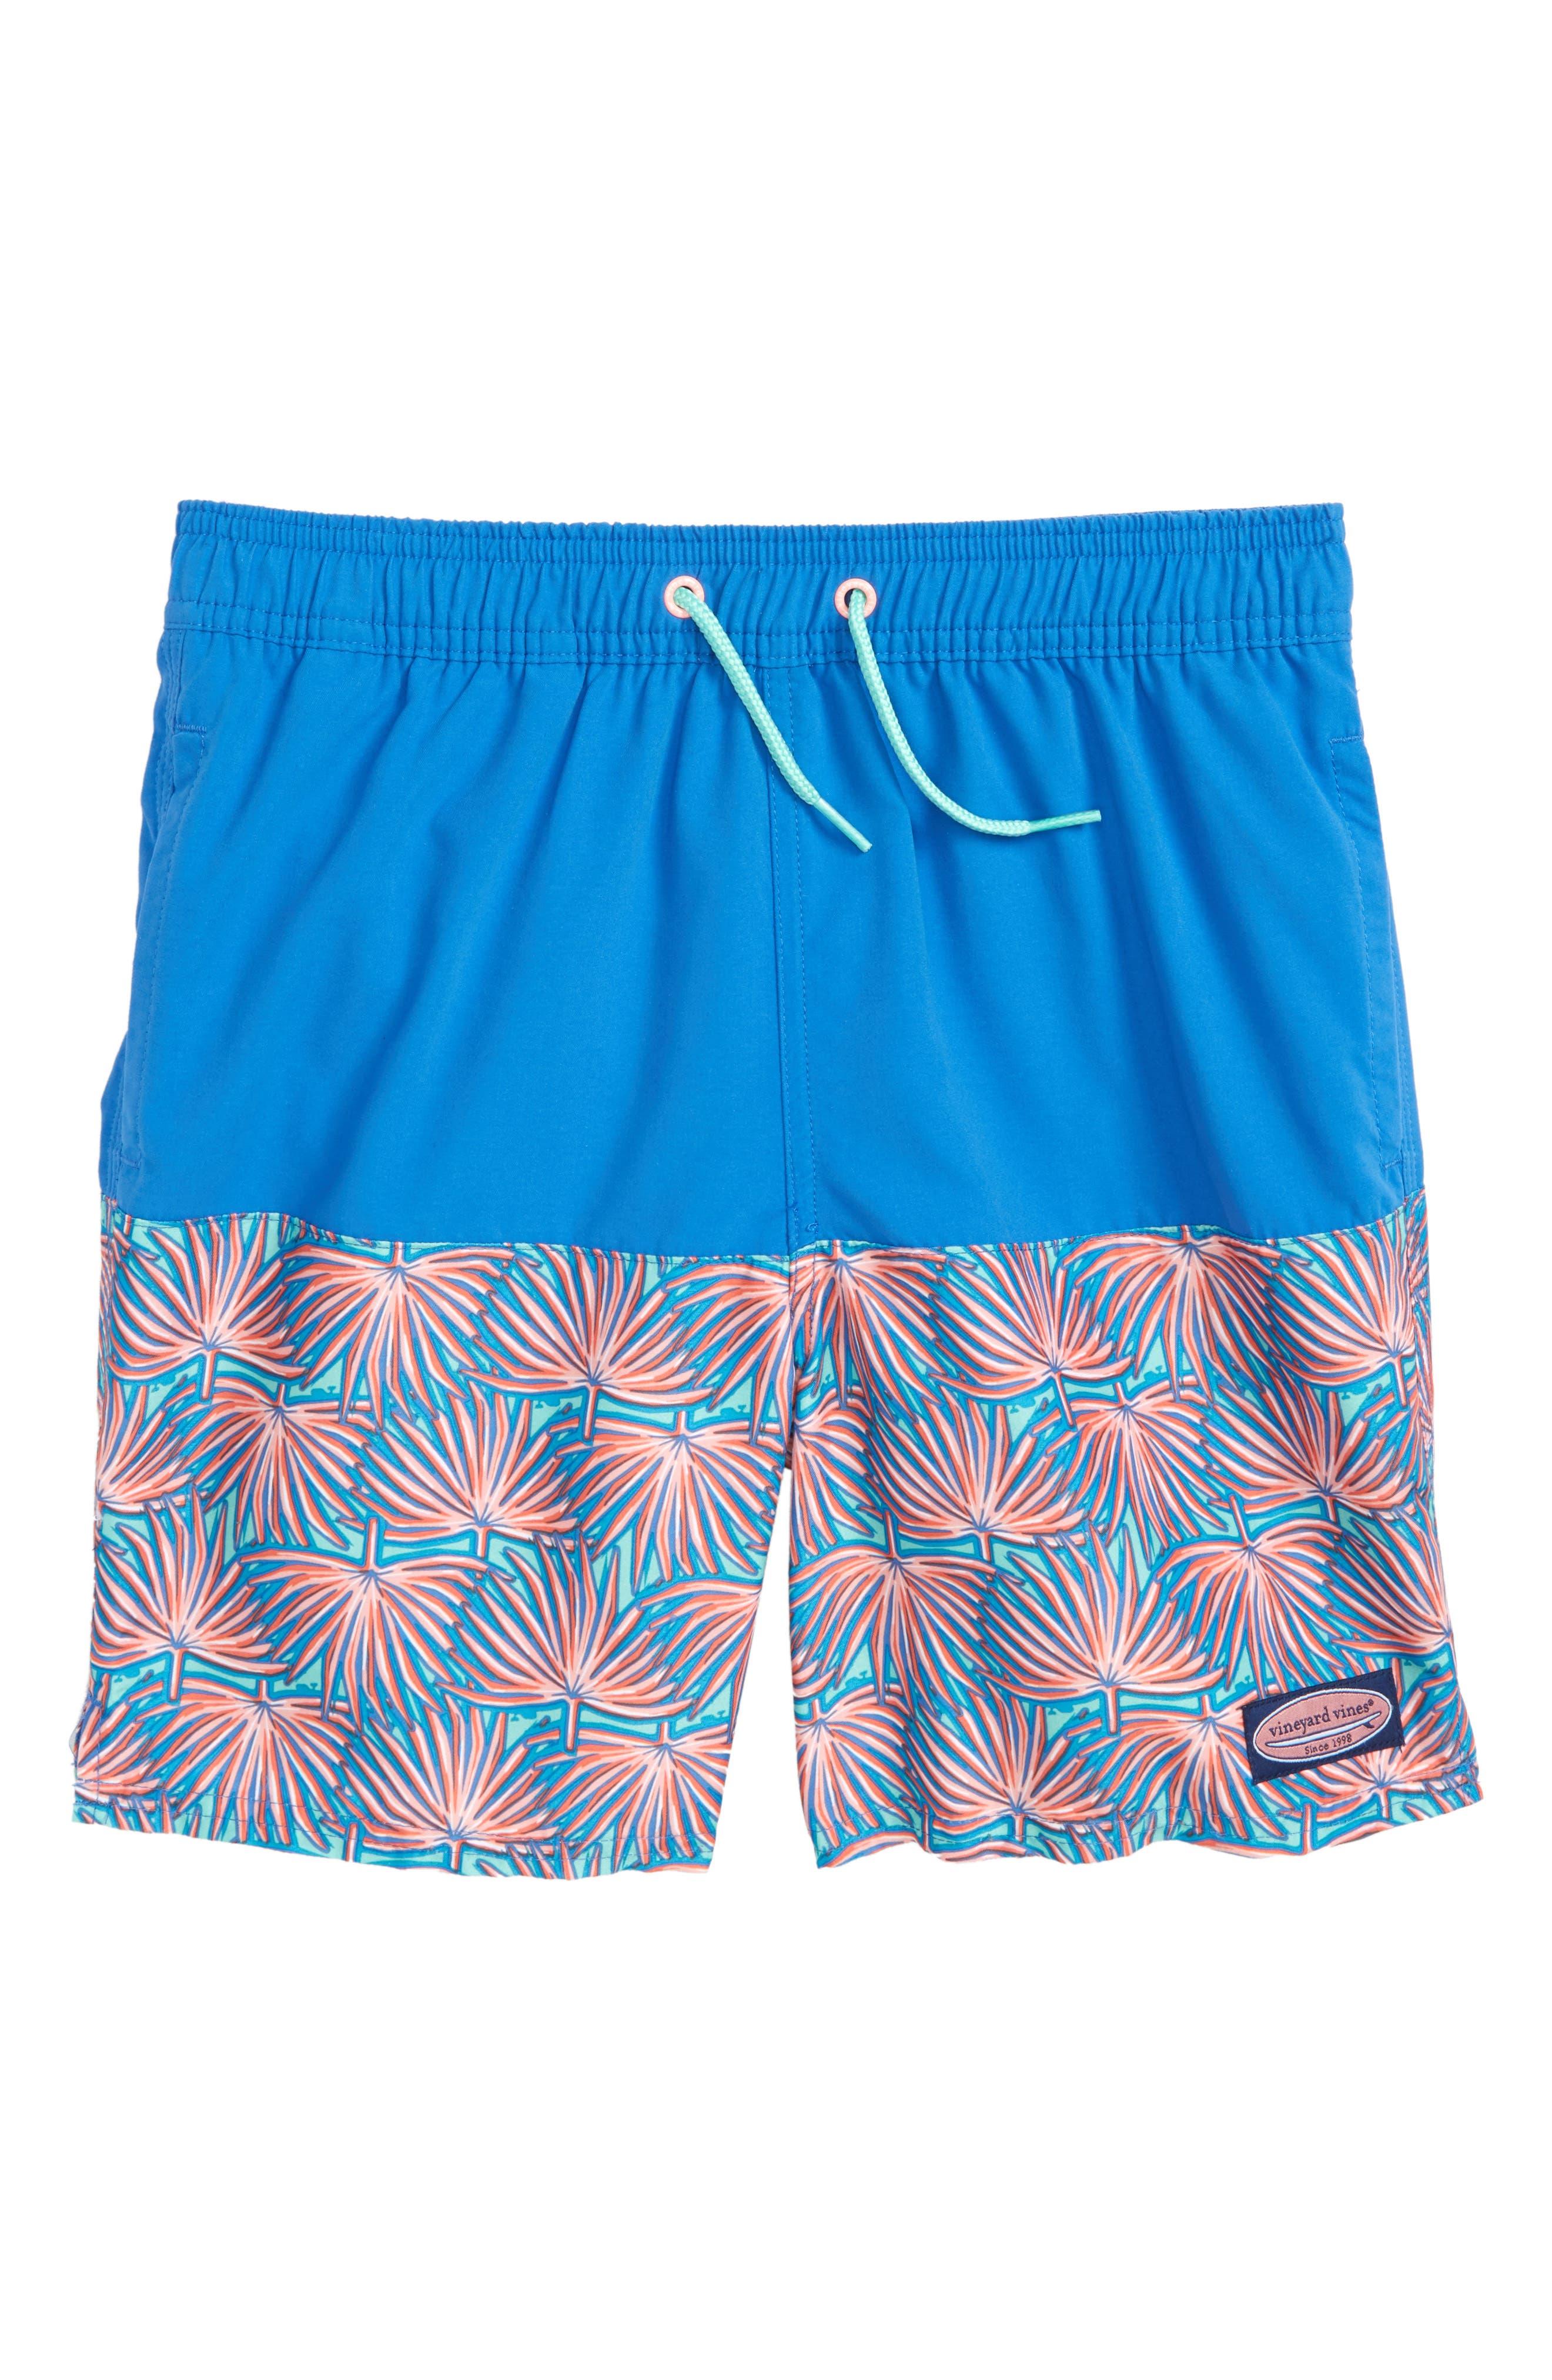 Chappy Fan Palm Print Swim Trunks,                             Main thumbnail 1, color,                             Capri Blue